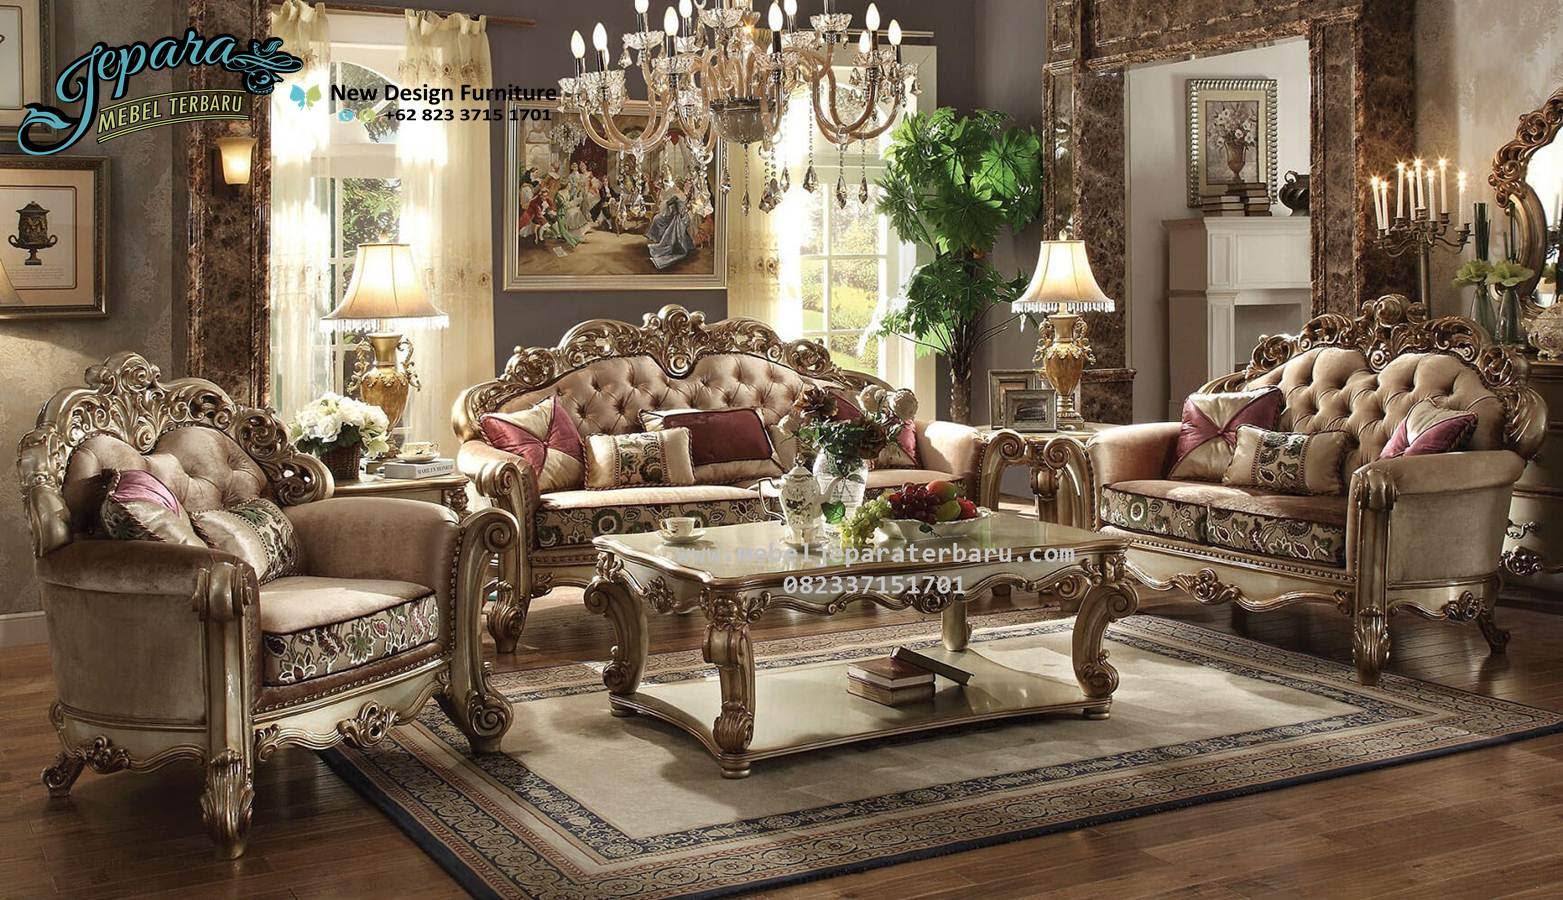 Sofa Ruang Keluarga Minimalis Mewah Vendome SST 073 Sofa Ruang Tamu